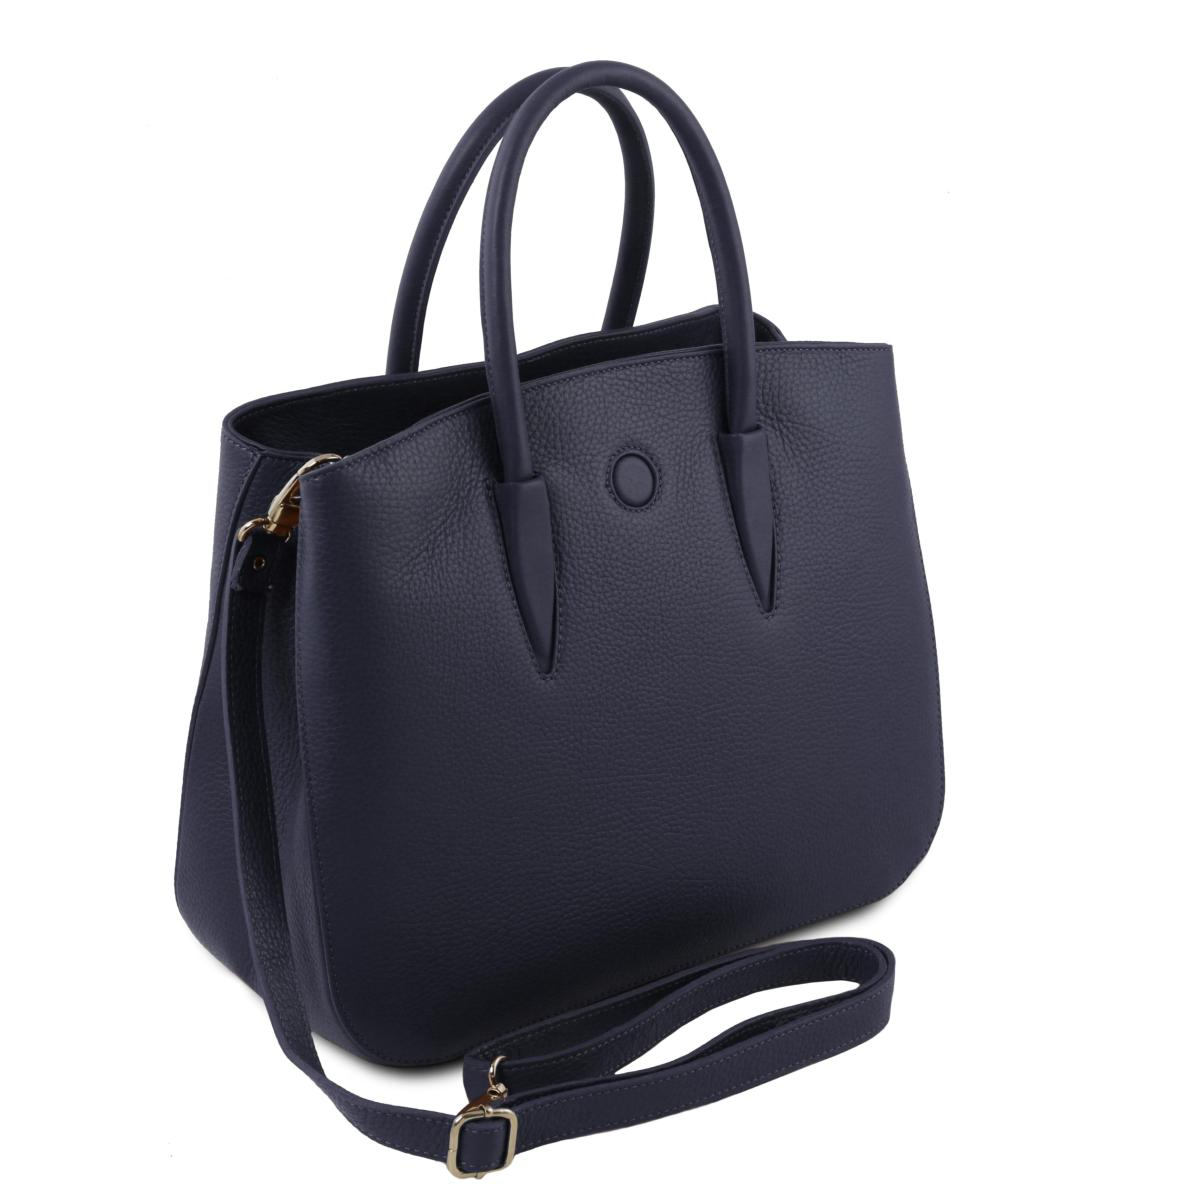 93d14595ad04 Sac Cabas Cuir Souple Femme Bleu - Tuscany Leather -